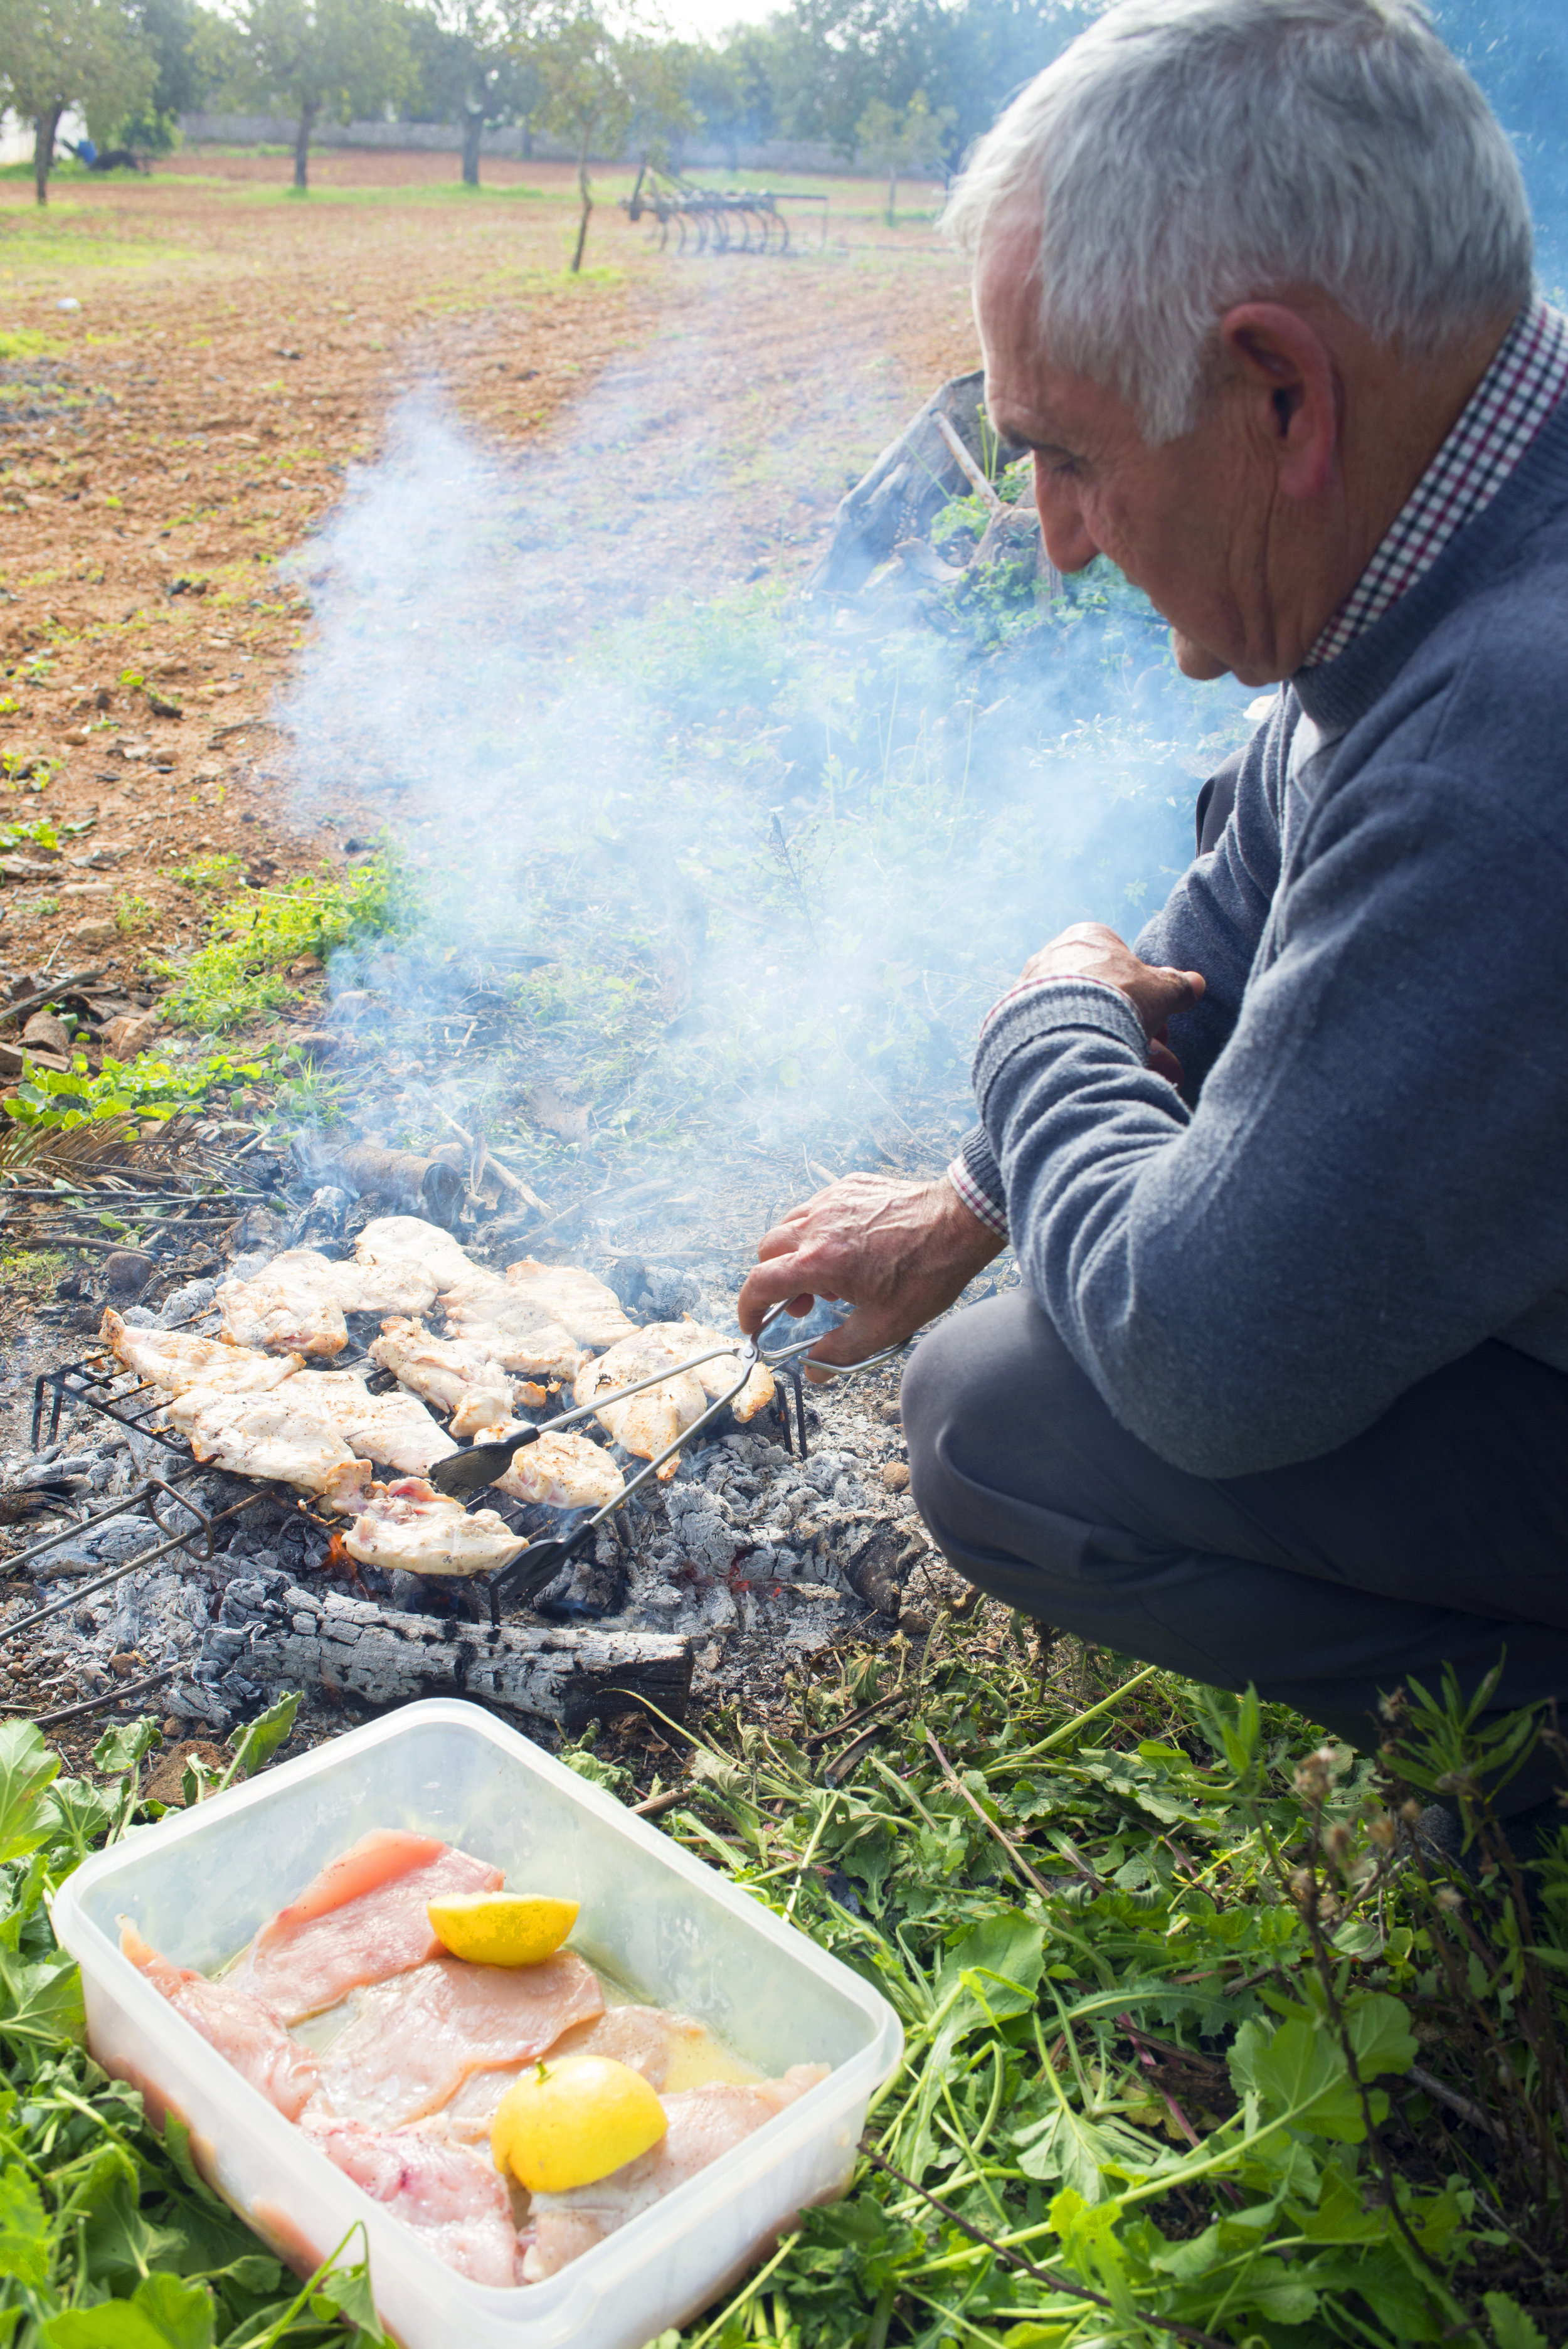 Grilling chicken Mallorcan style. Porreres, Mallorca Spain.